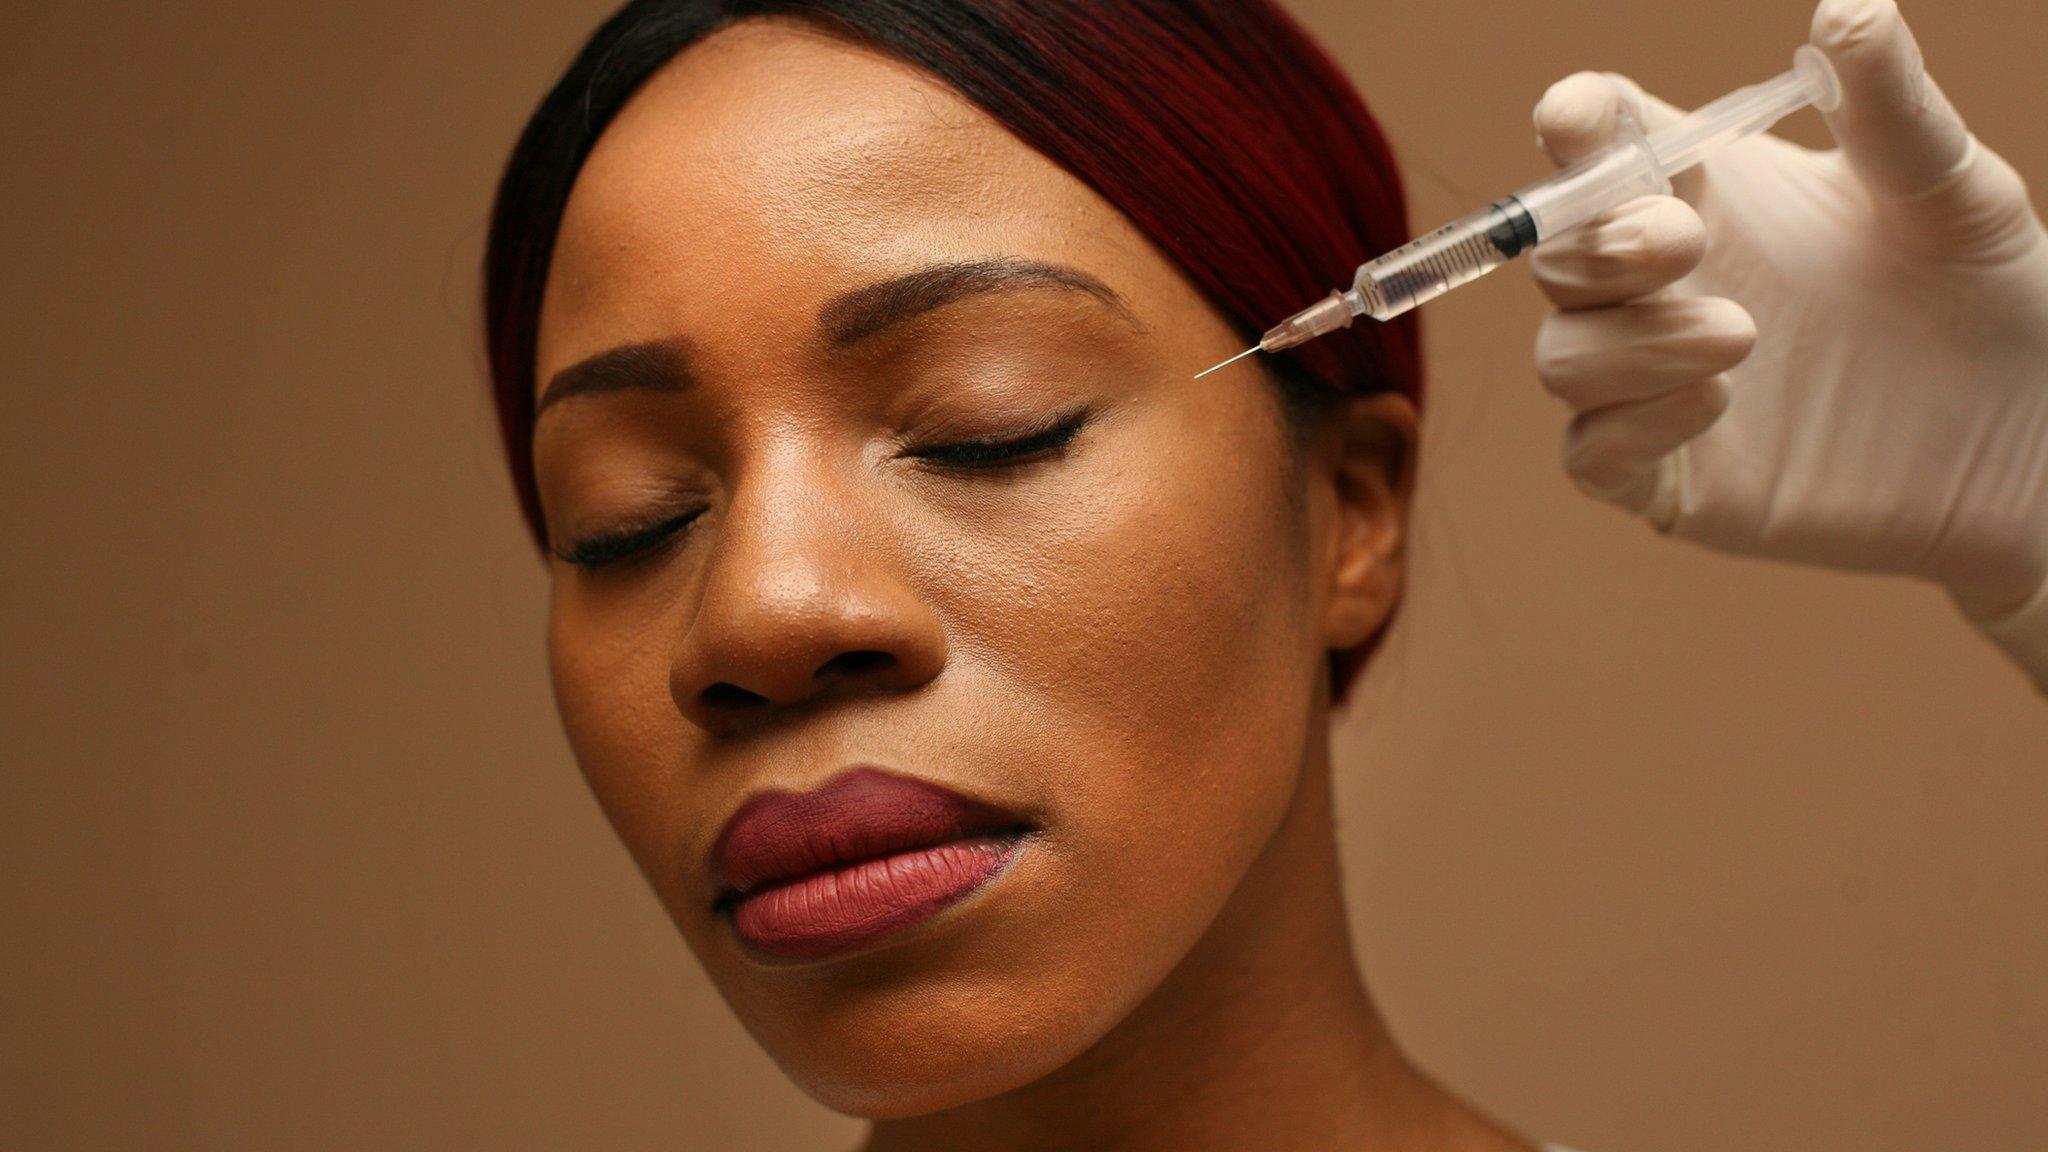 Superdrug enhances pre-Botox mental health checks